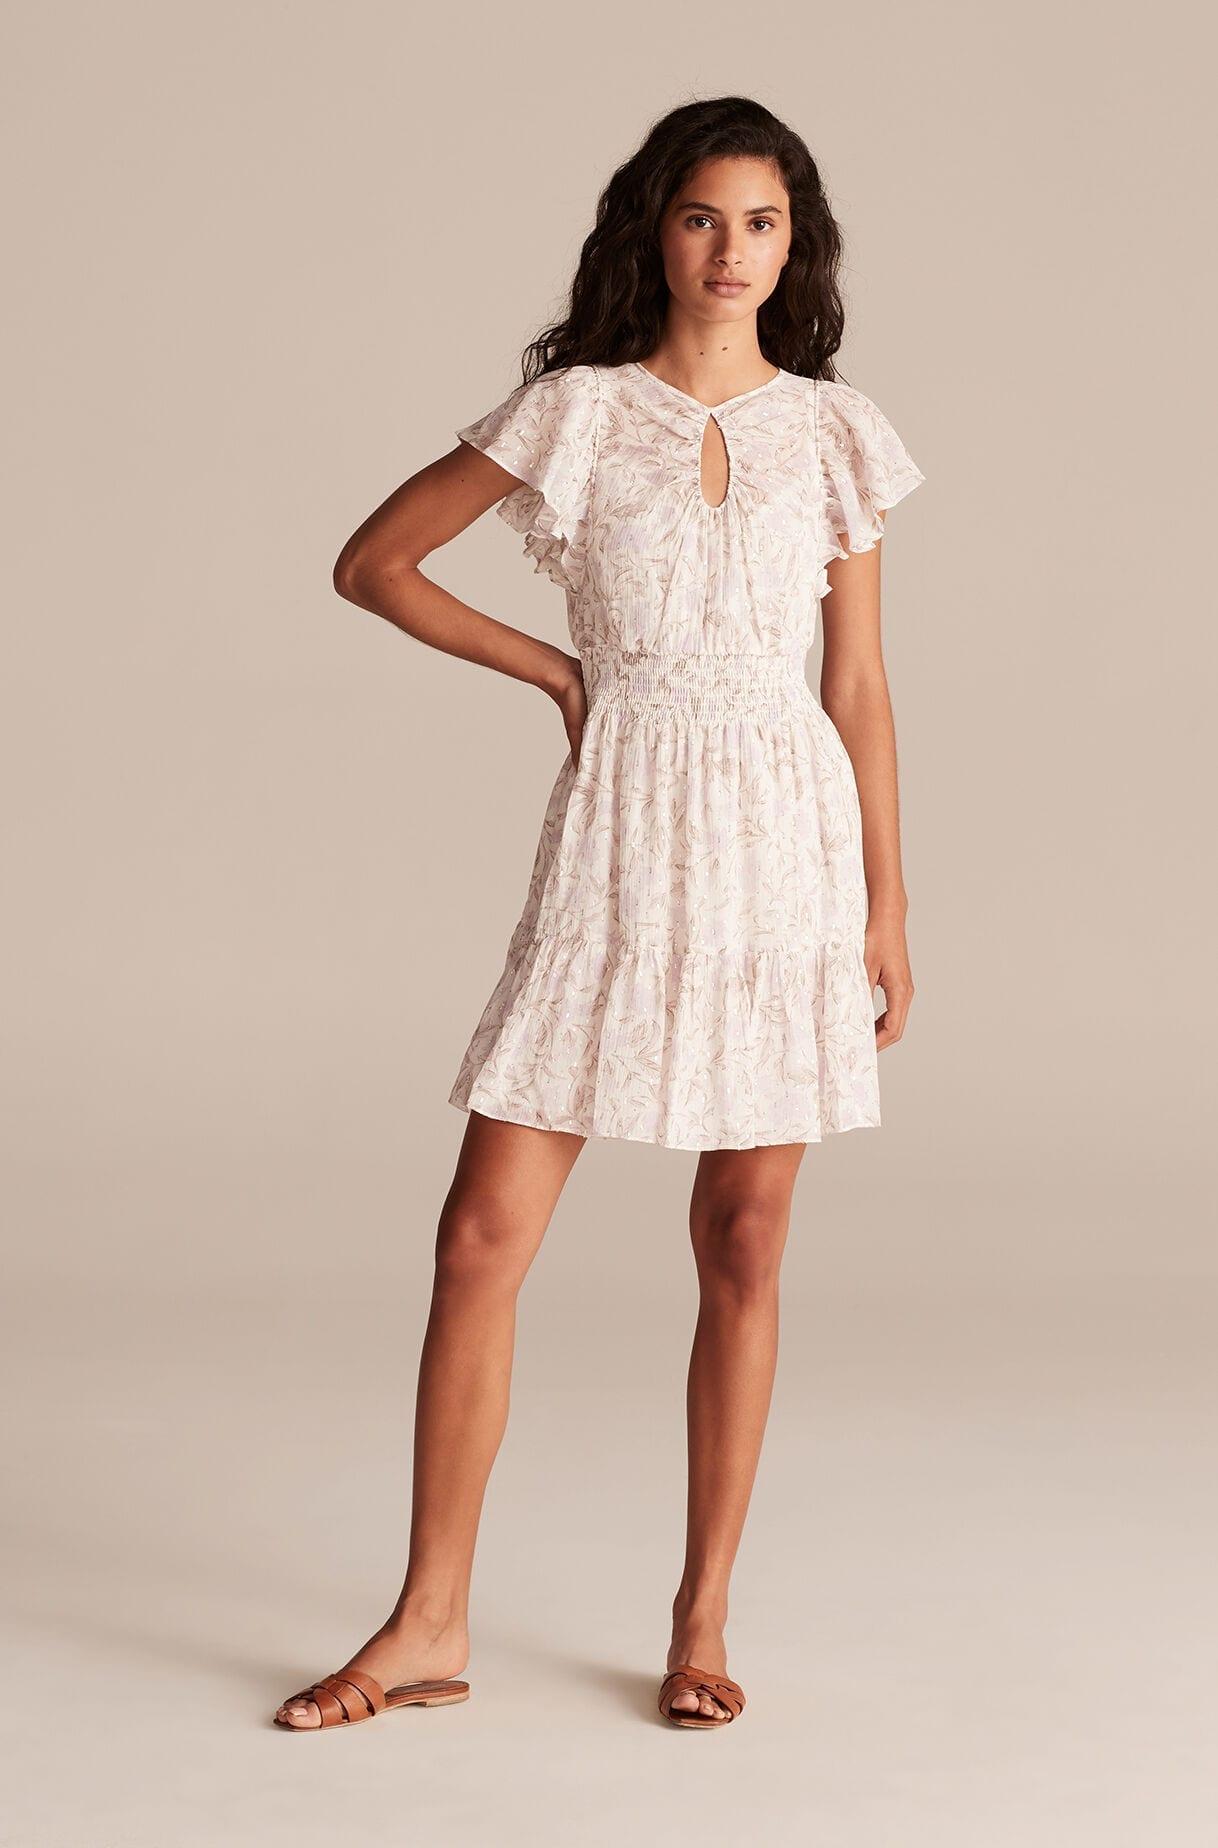 REBECCA TAYLOR Esmee Fleur Floral Tank Dress - We Select